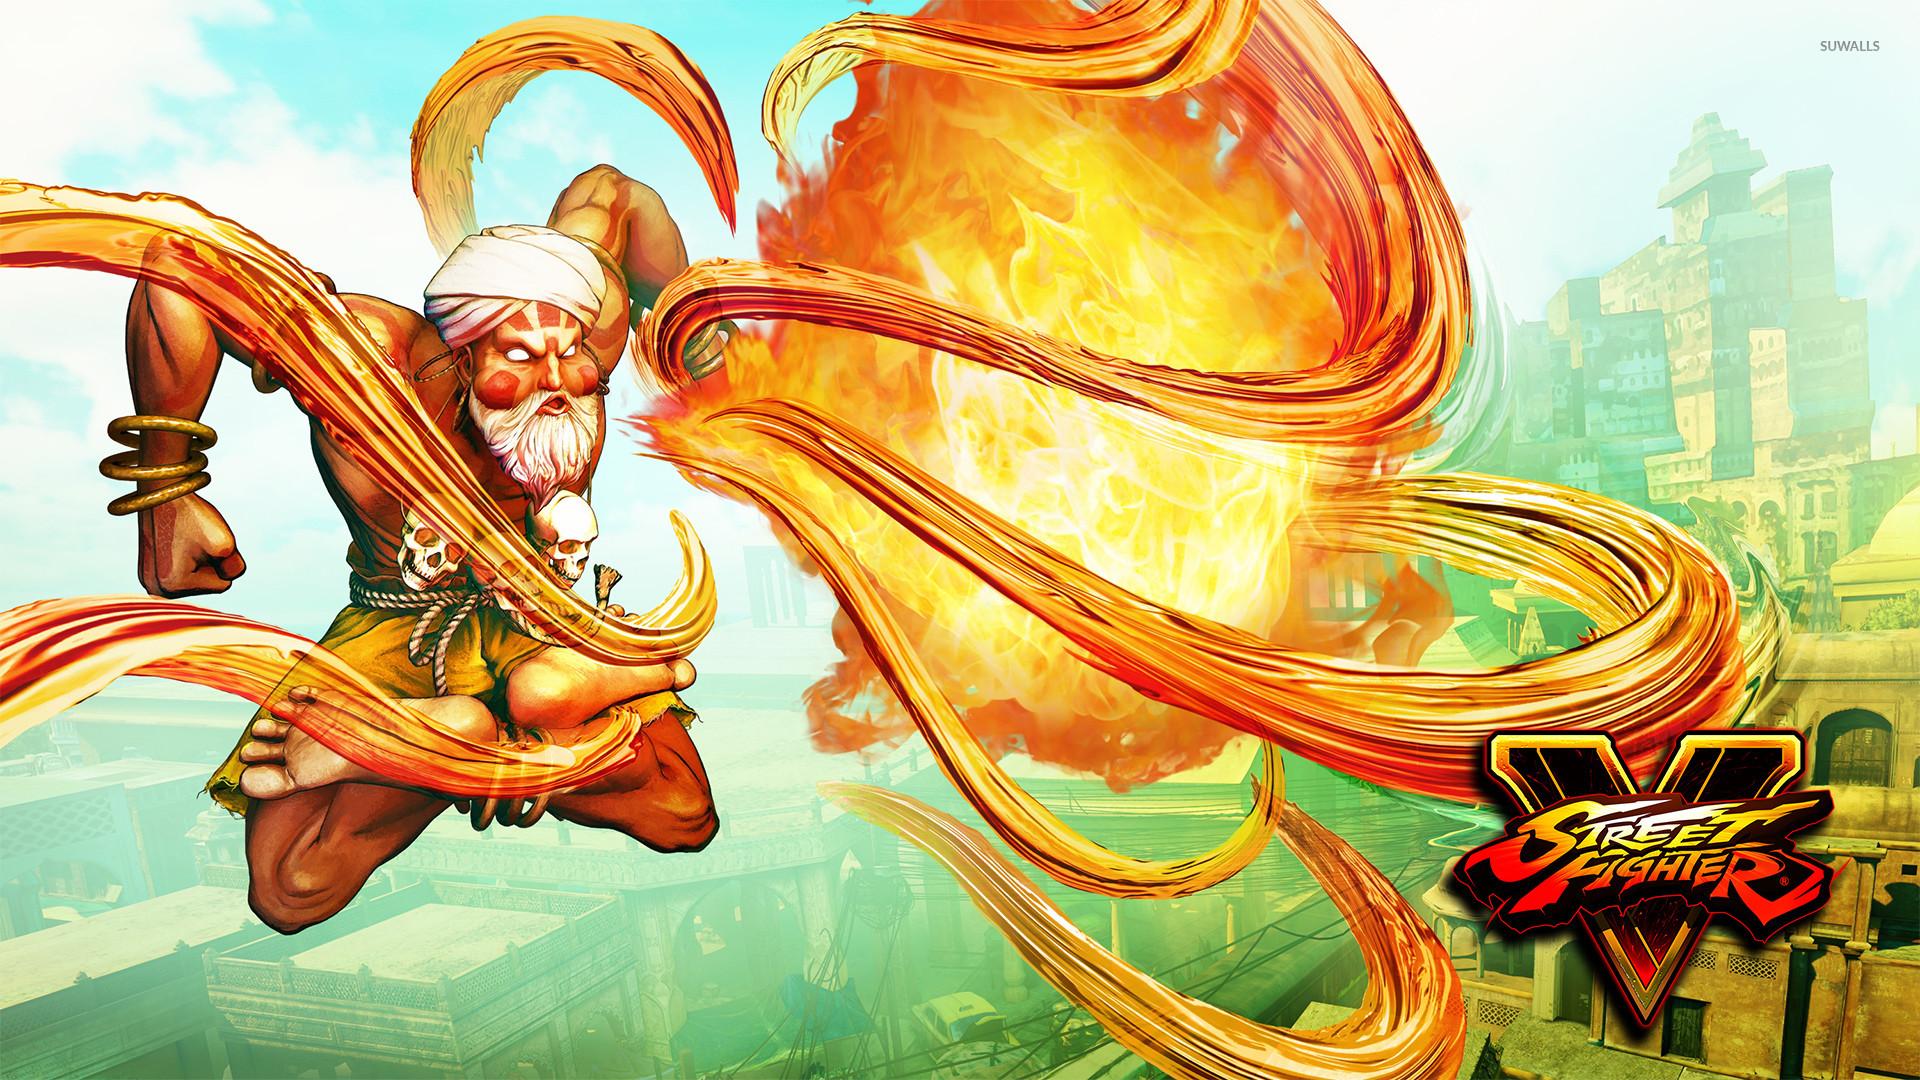 Dhalsim in Street Fighter V wallpaper